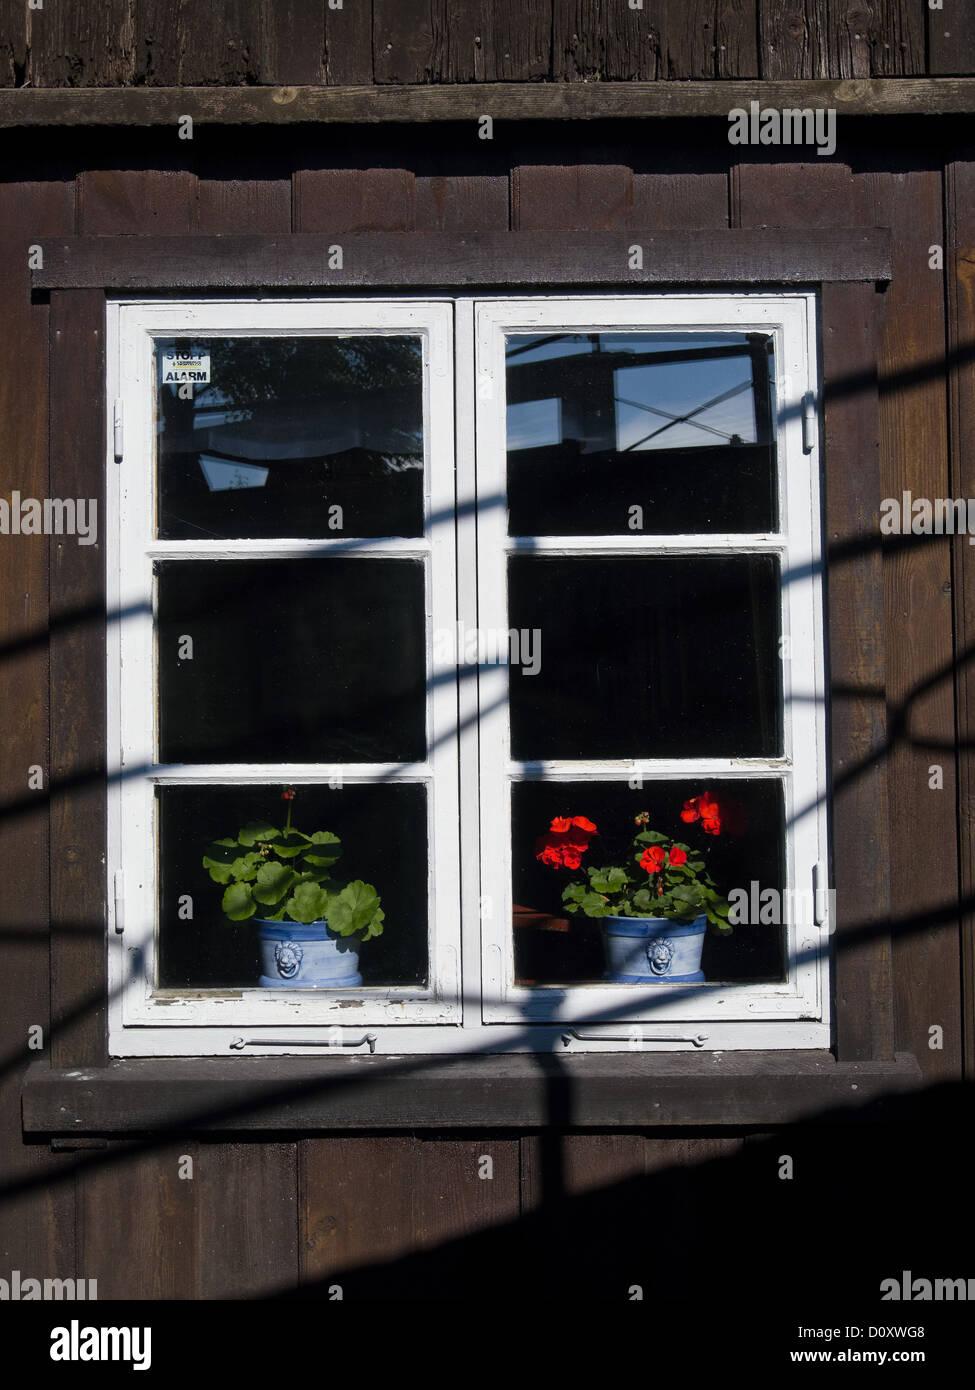 Blue colors work, Buskerud, window, windowsill, geraniums, timber house, Norge, Norway, Scandinavia - Stock Image